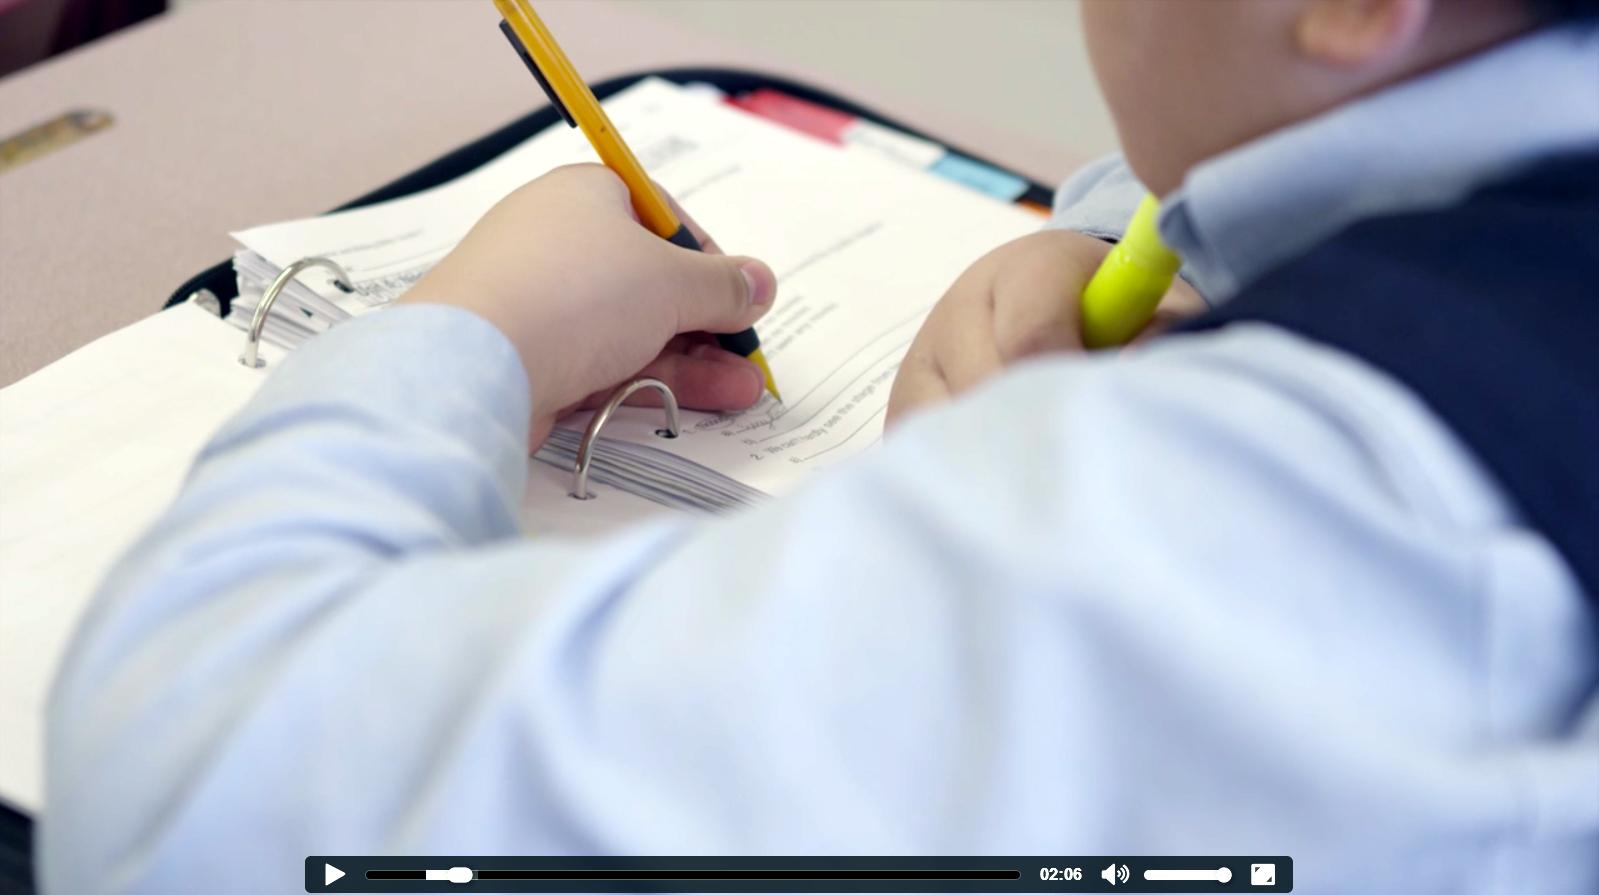 Homepage - Student Writing in Binder